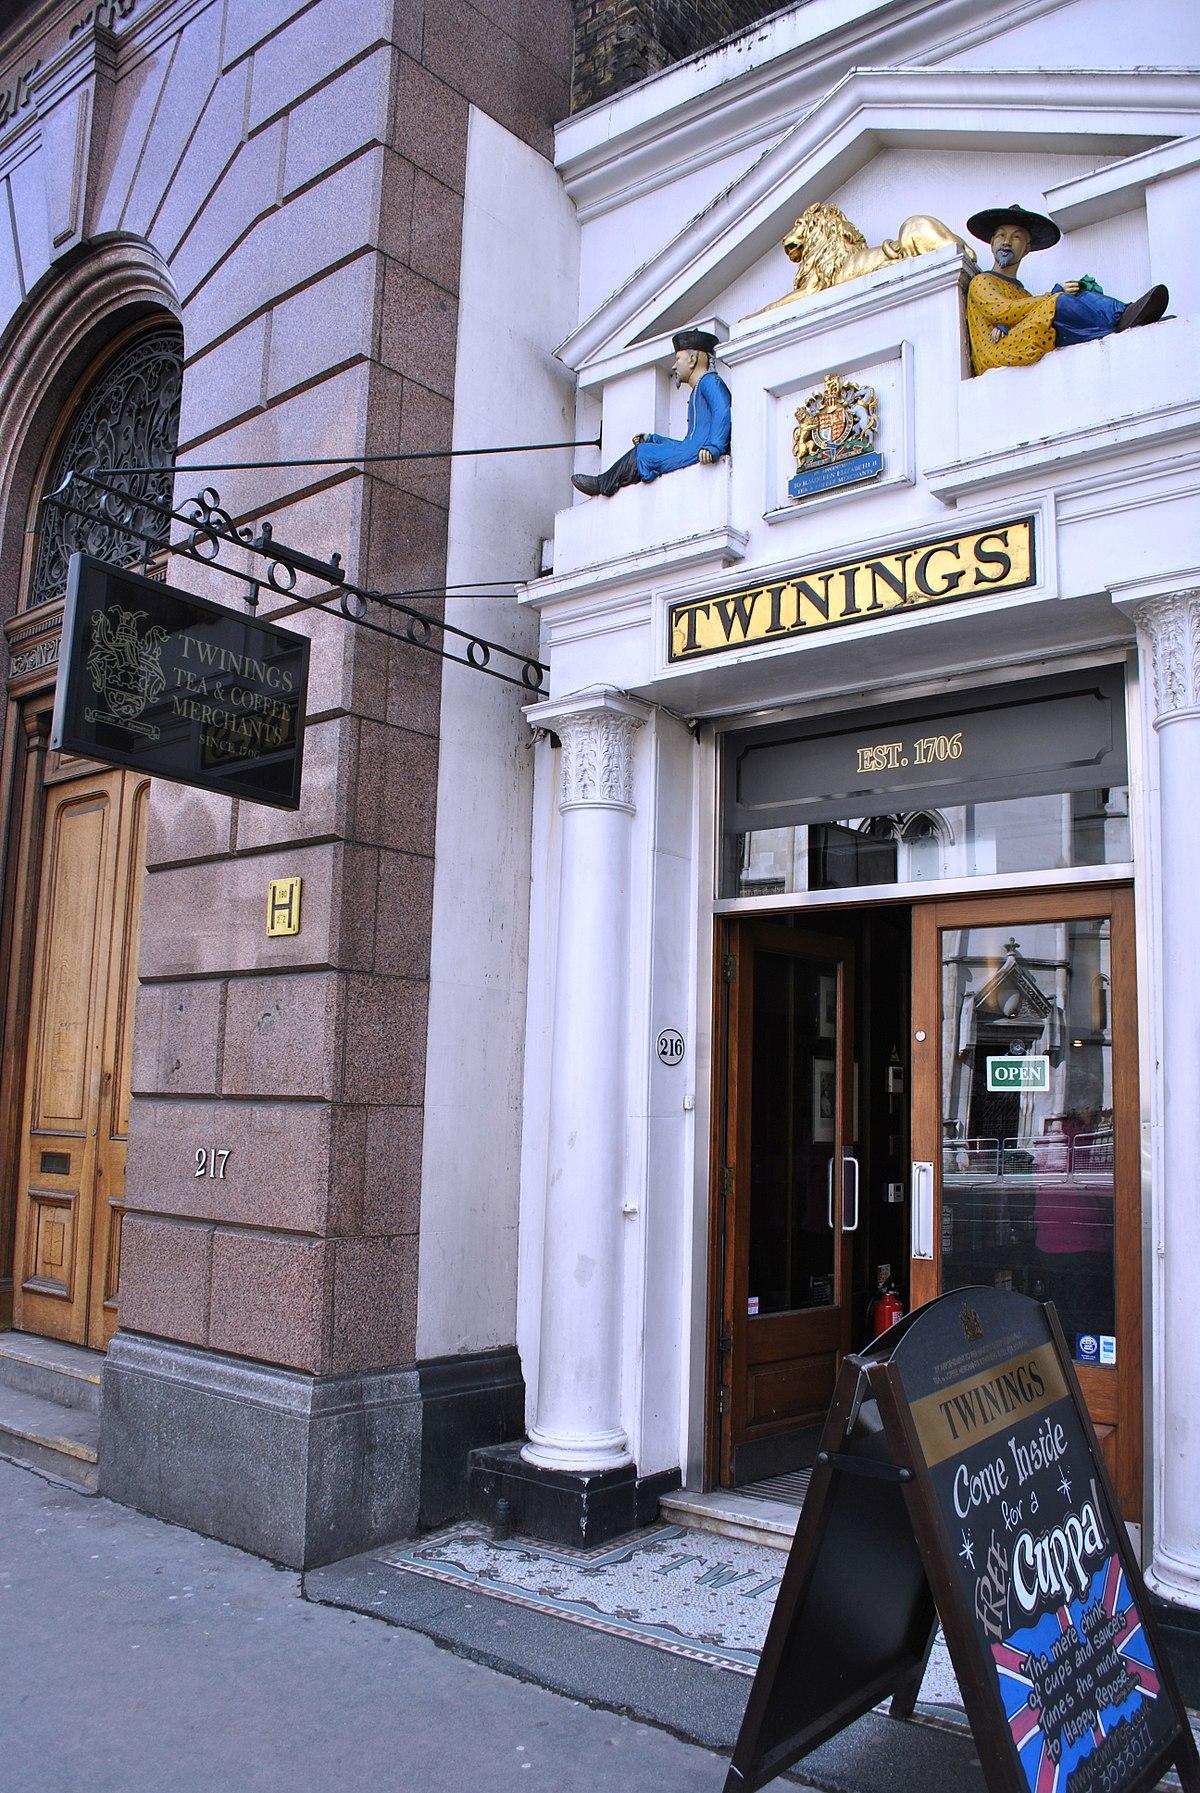 Twinings - Wikipedia